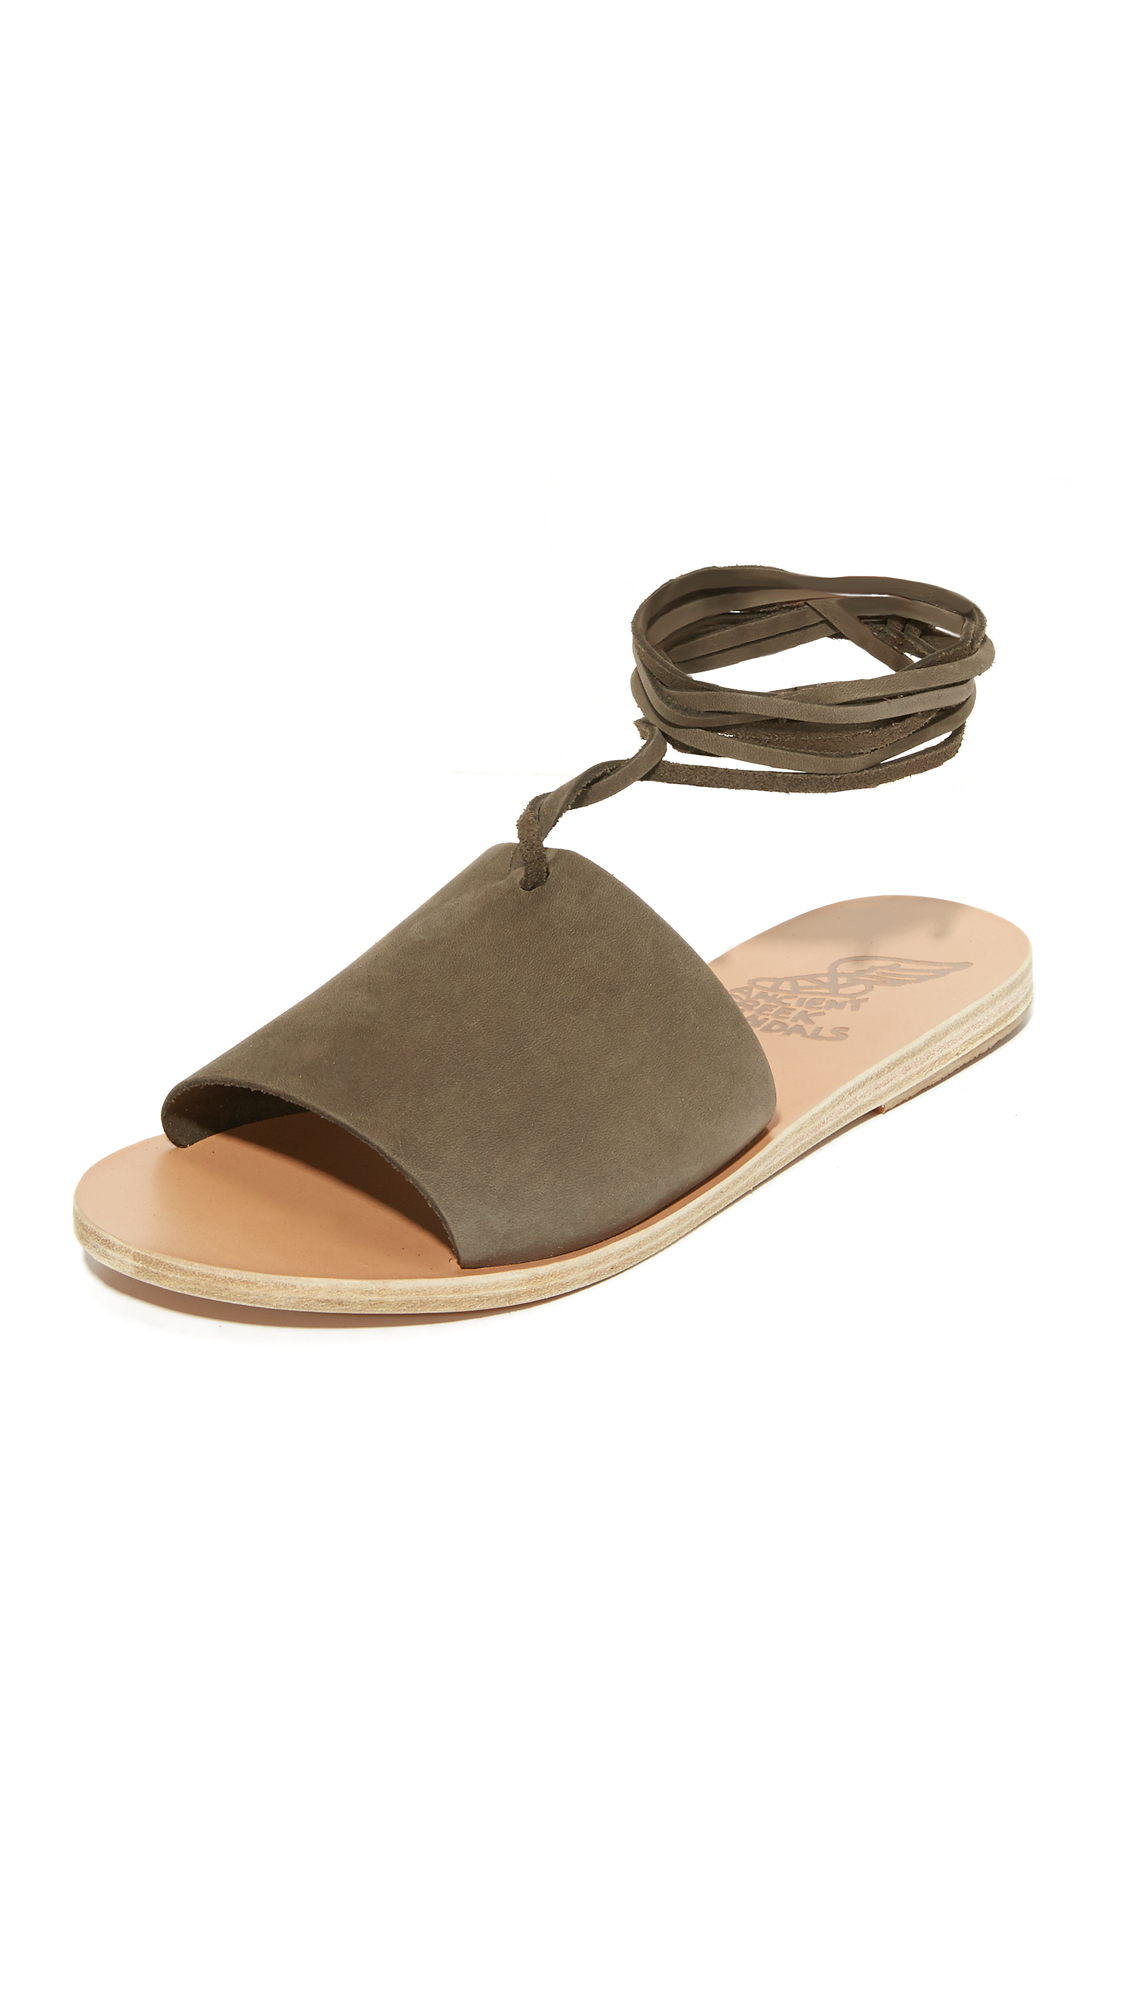 Ancient Greek Sandals Christina Wrap Sandals - Khaki at Shopbop